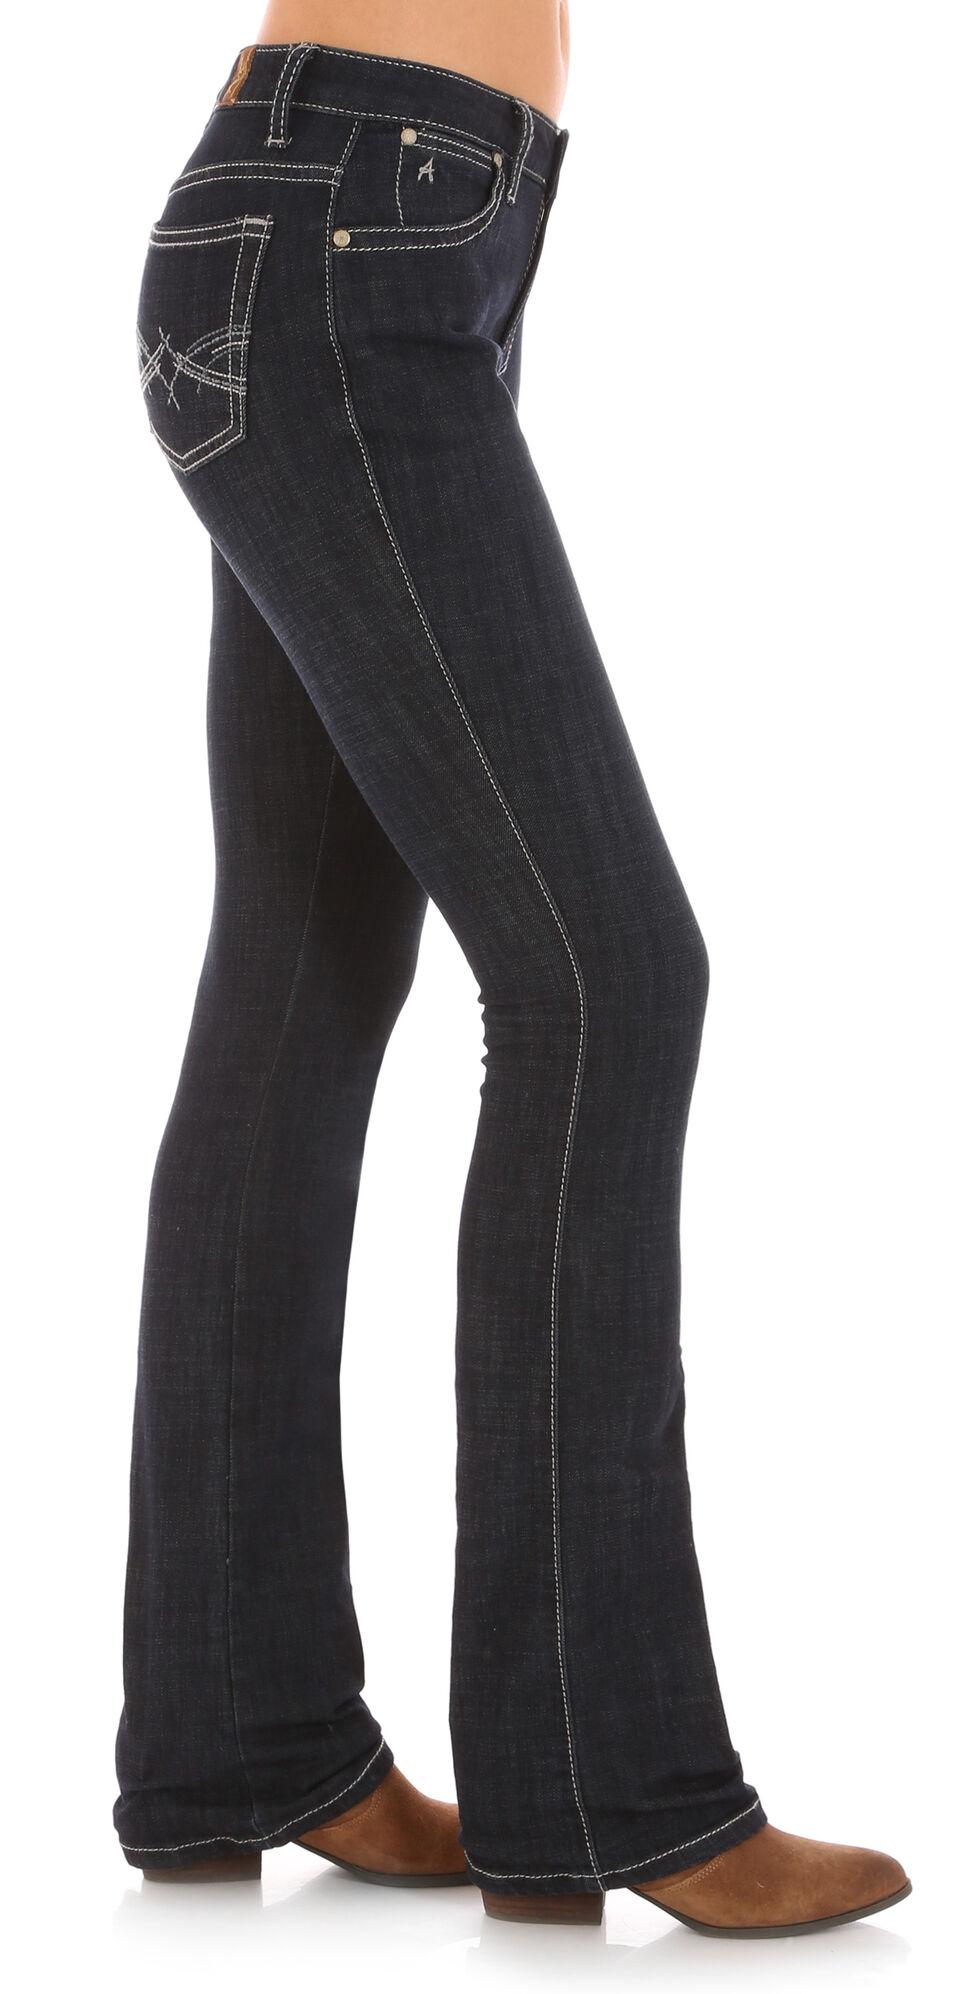 Wrangler Women's Dark Rinse Aura Instantly Slimming Jeans, Indigo, hi-res